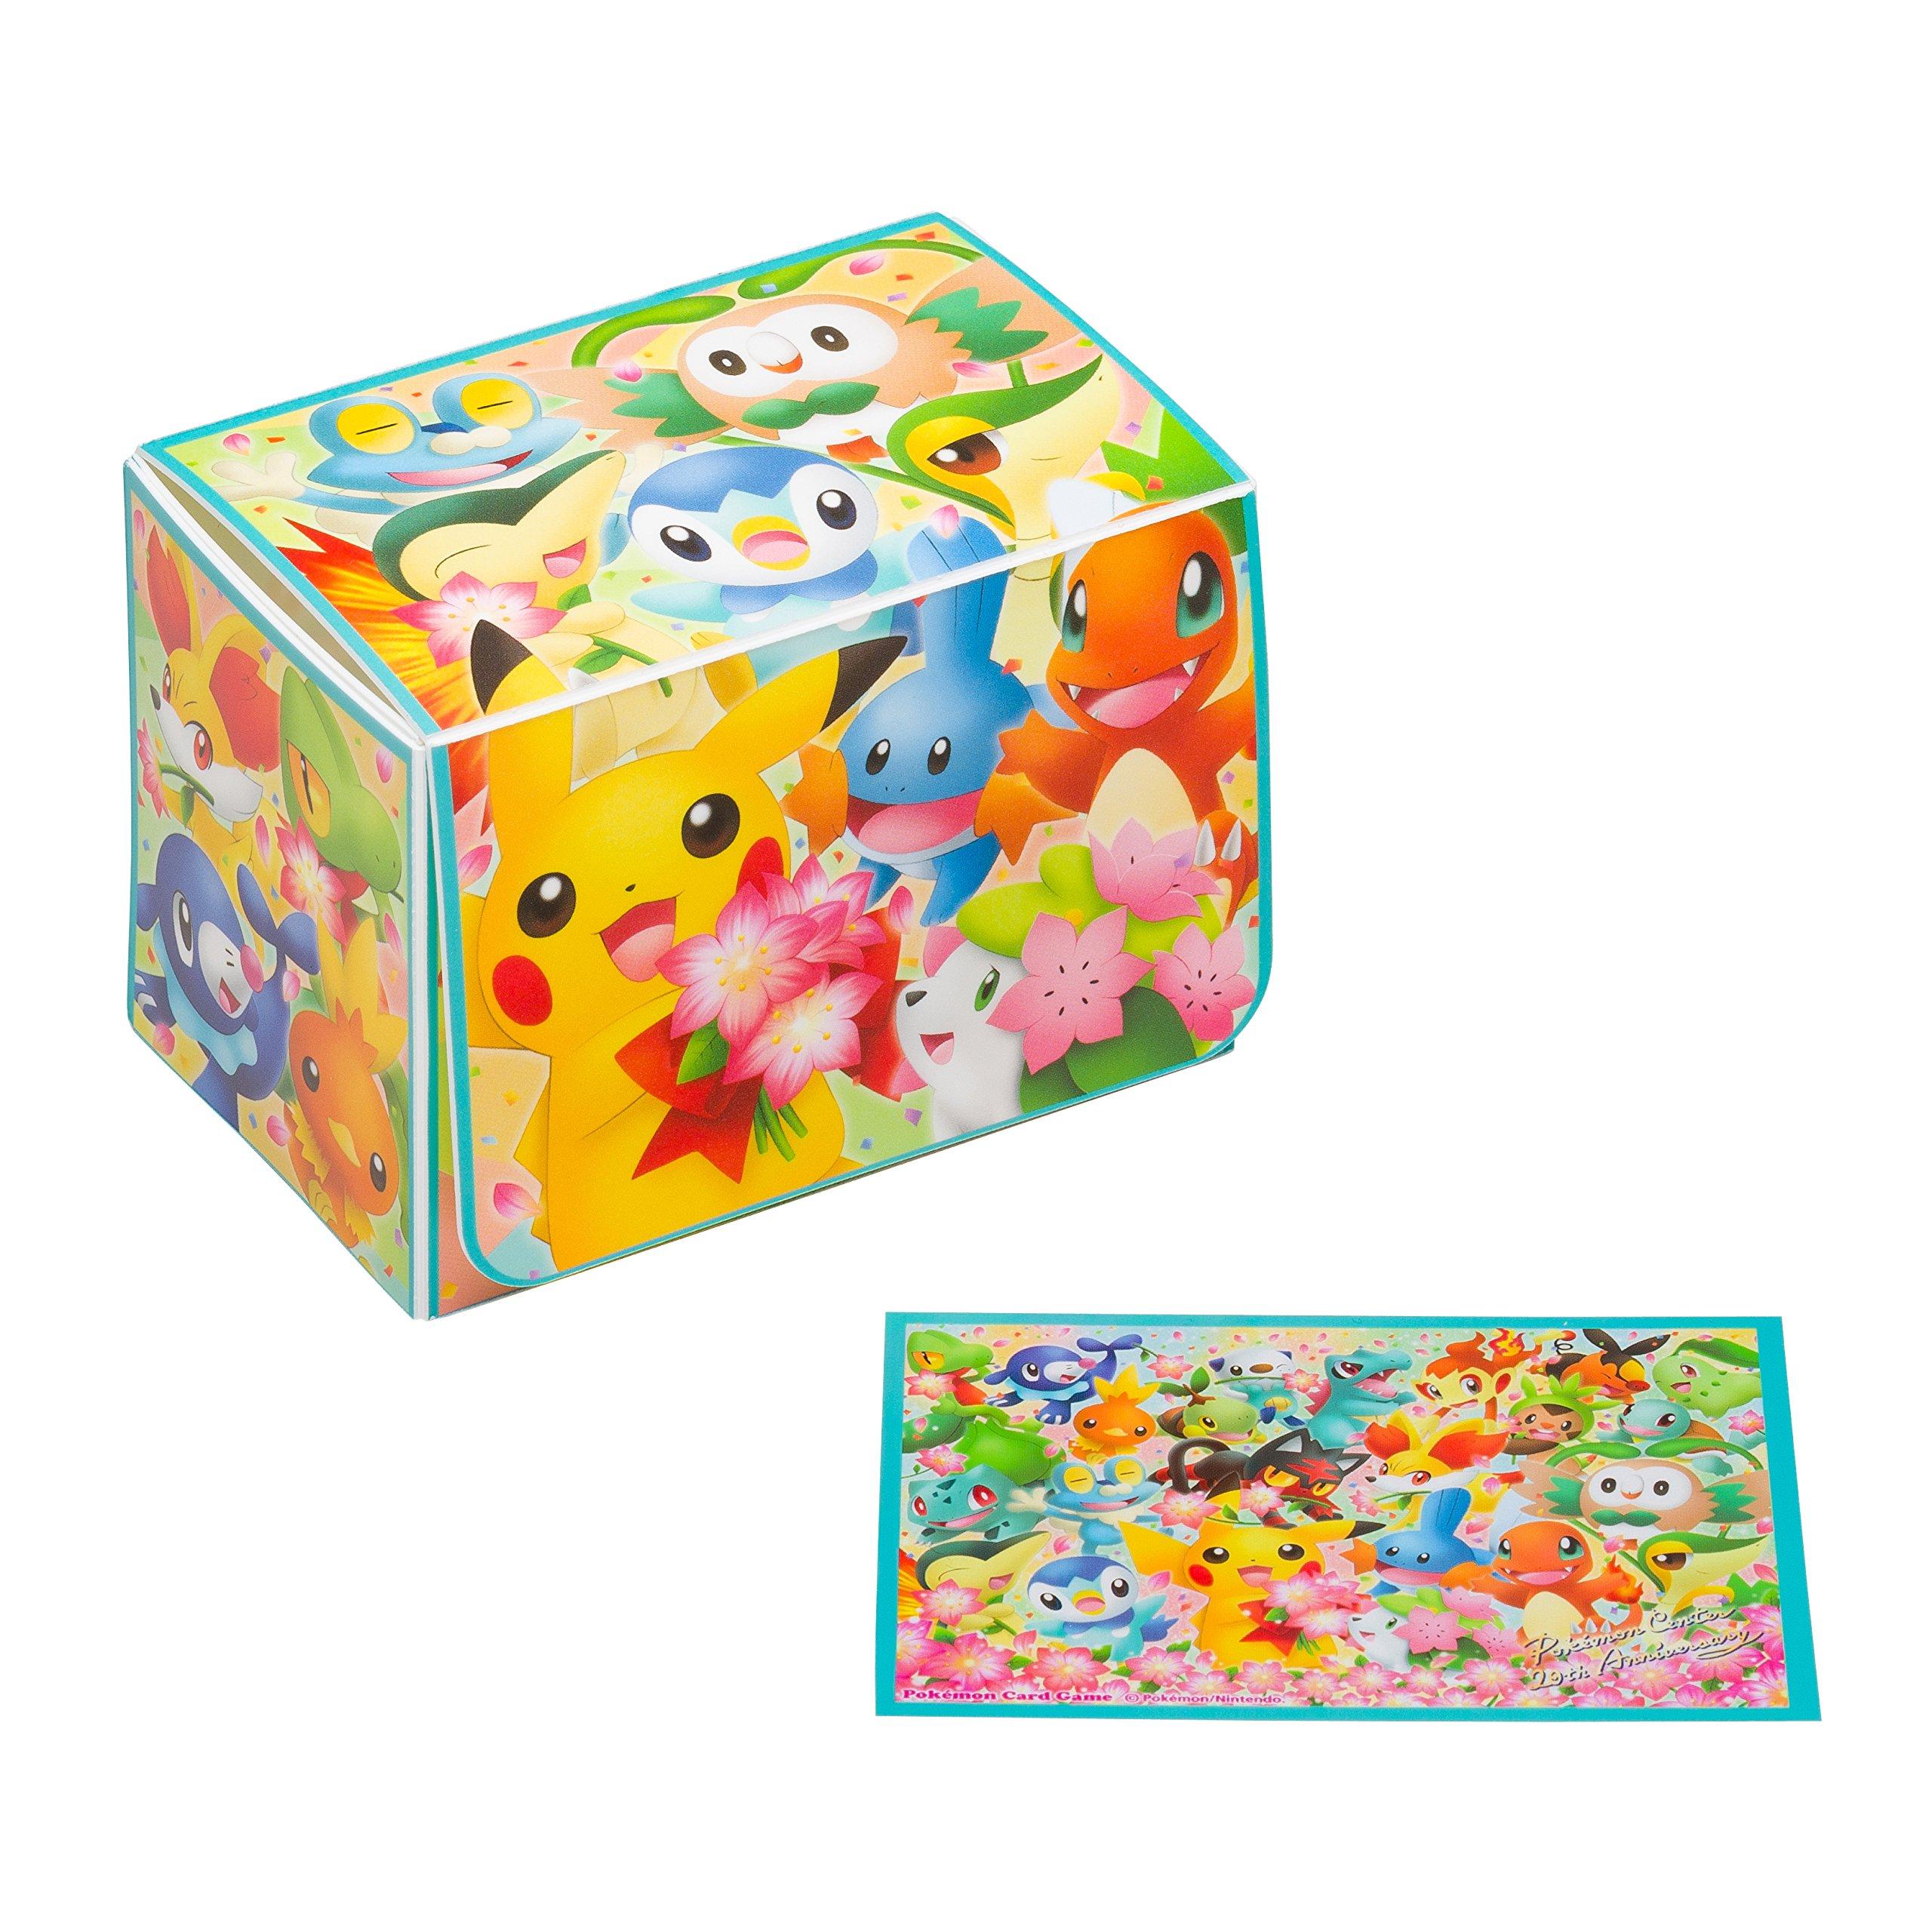 Anime Pokemon Center Original 20th Anniversary Character Card Game 64 pc Sleeves Deck Box Case Holder Sun Moon